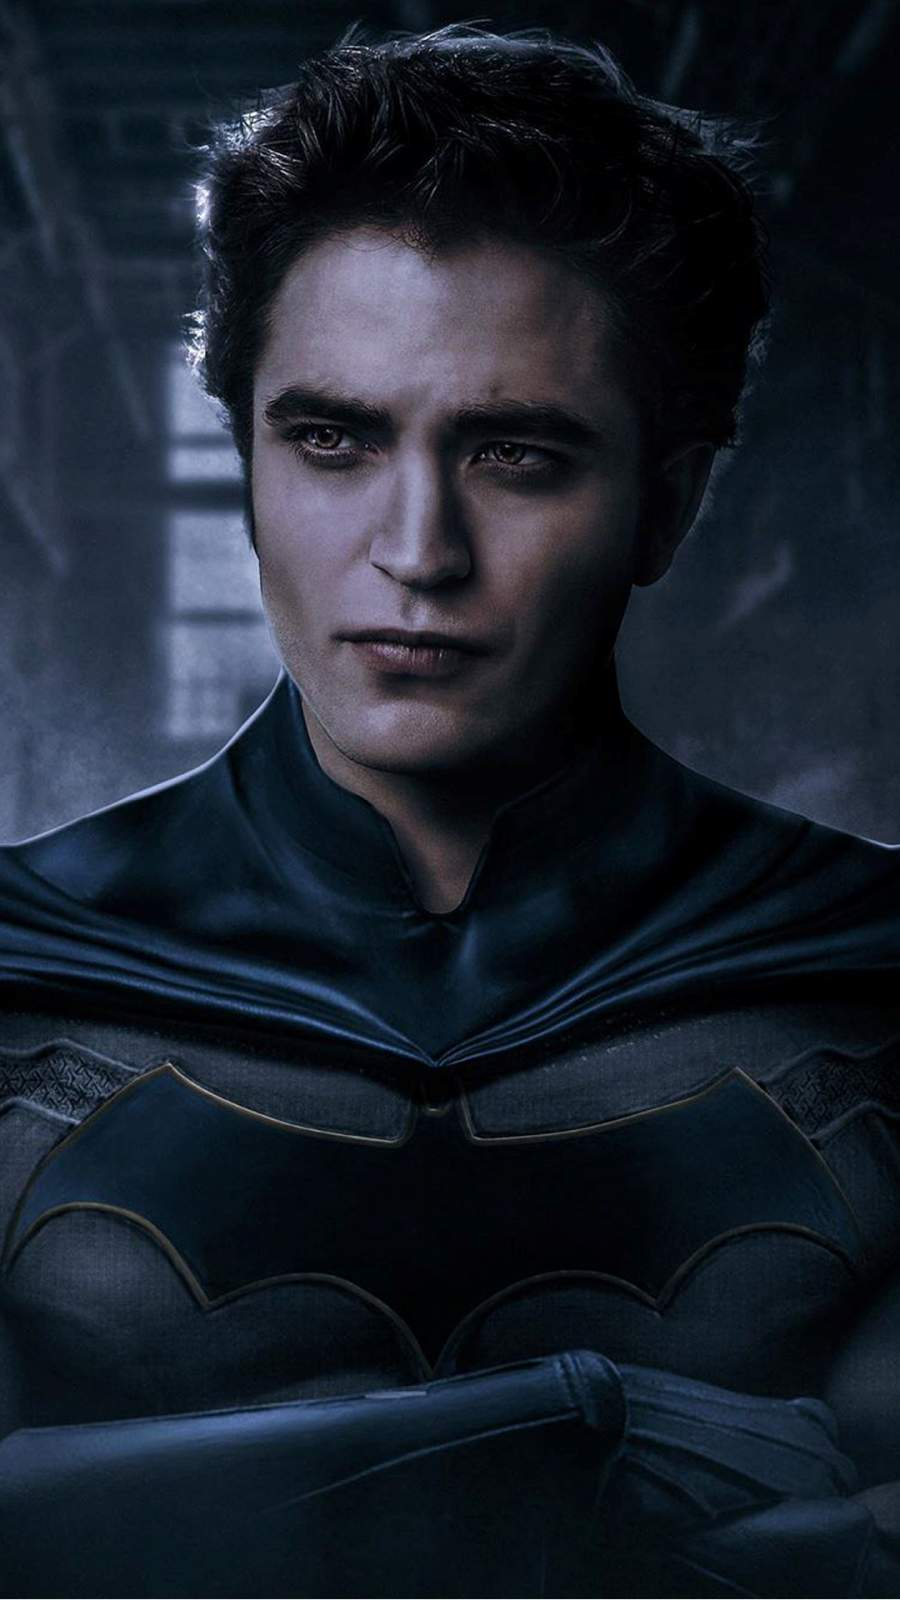 The Batman Robert Pattinson iPhone Wallpaper